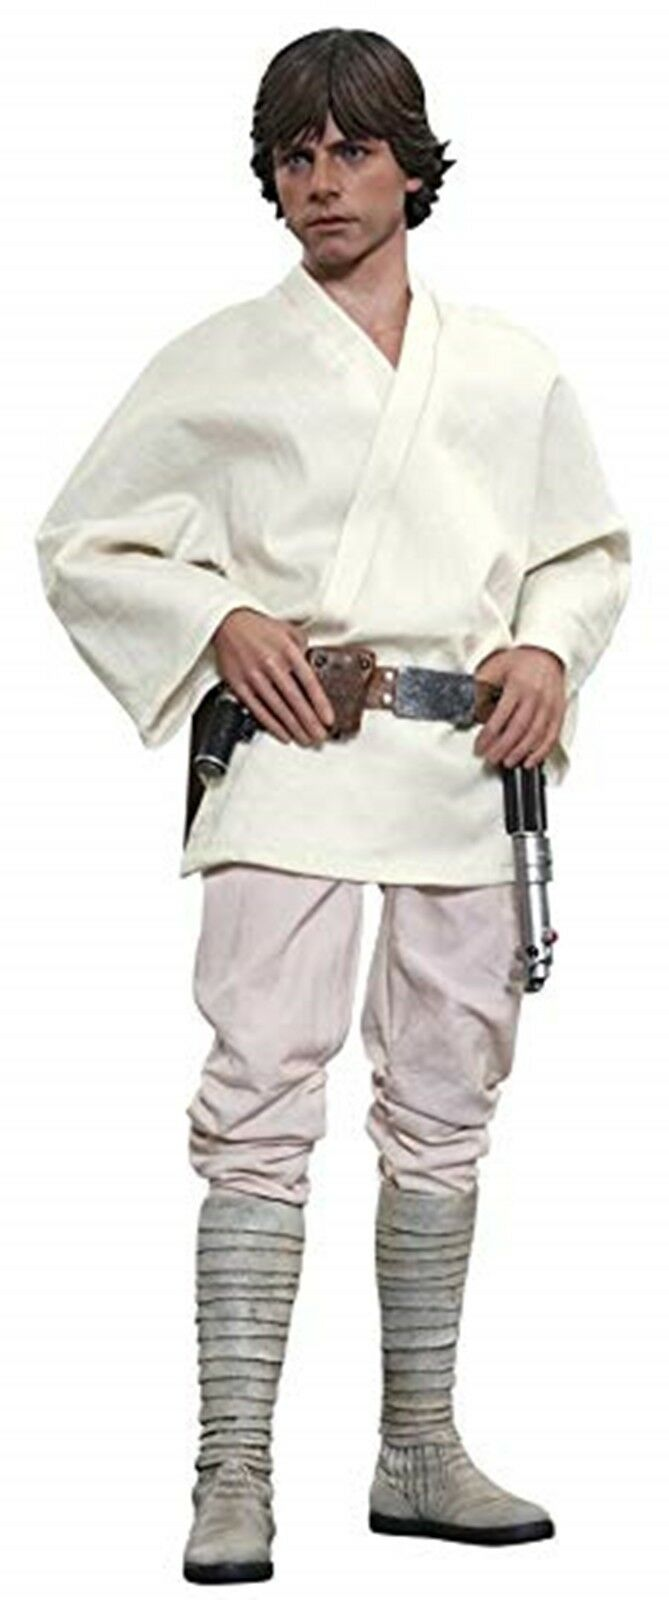 Movie Masterpiece Star Wars Episode 4 / New Hope Luke Skywalker 1/6 Hot Toys NEW